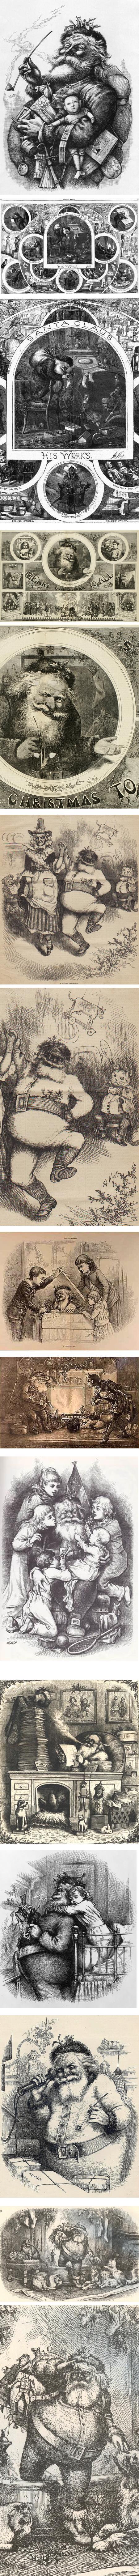 Thomas Nast's Santa Claus illustrations